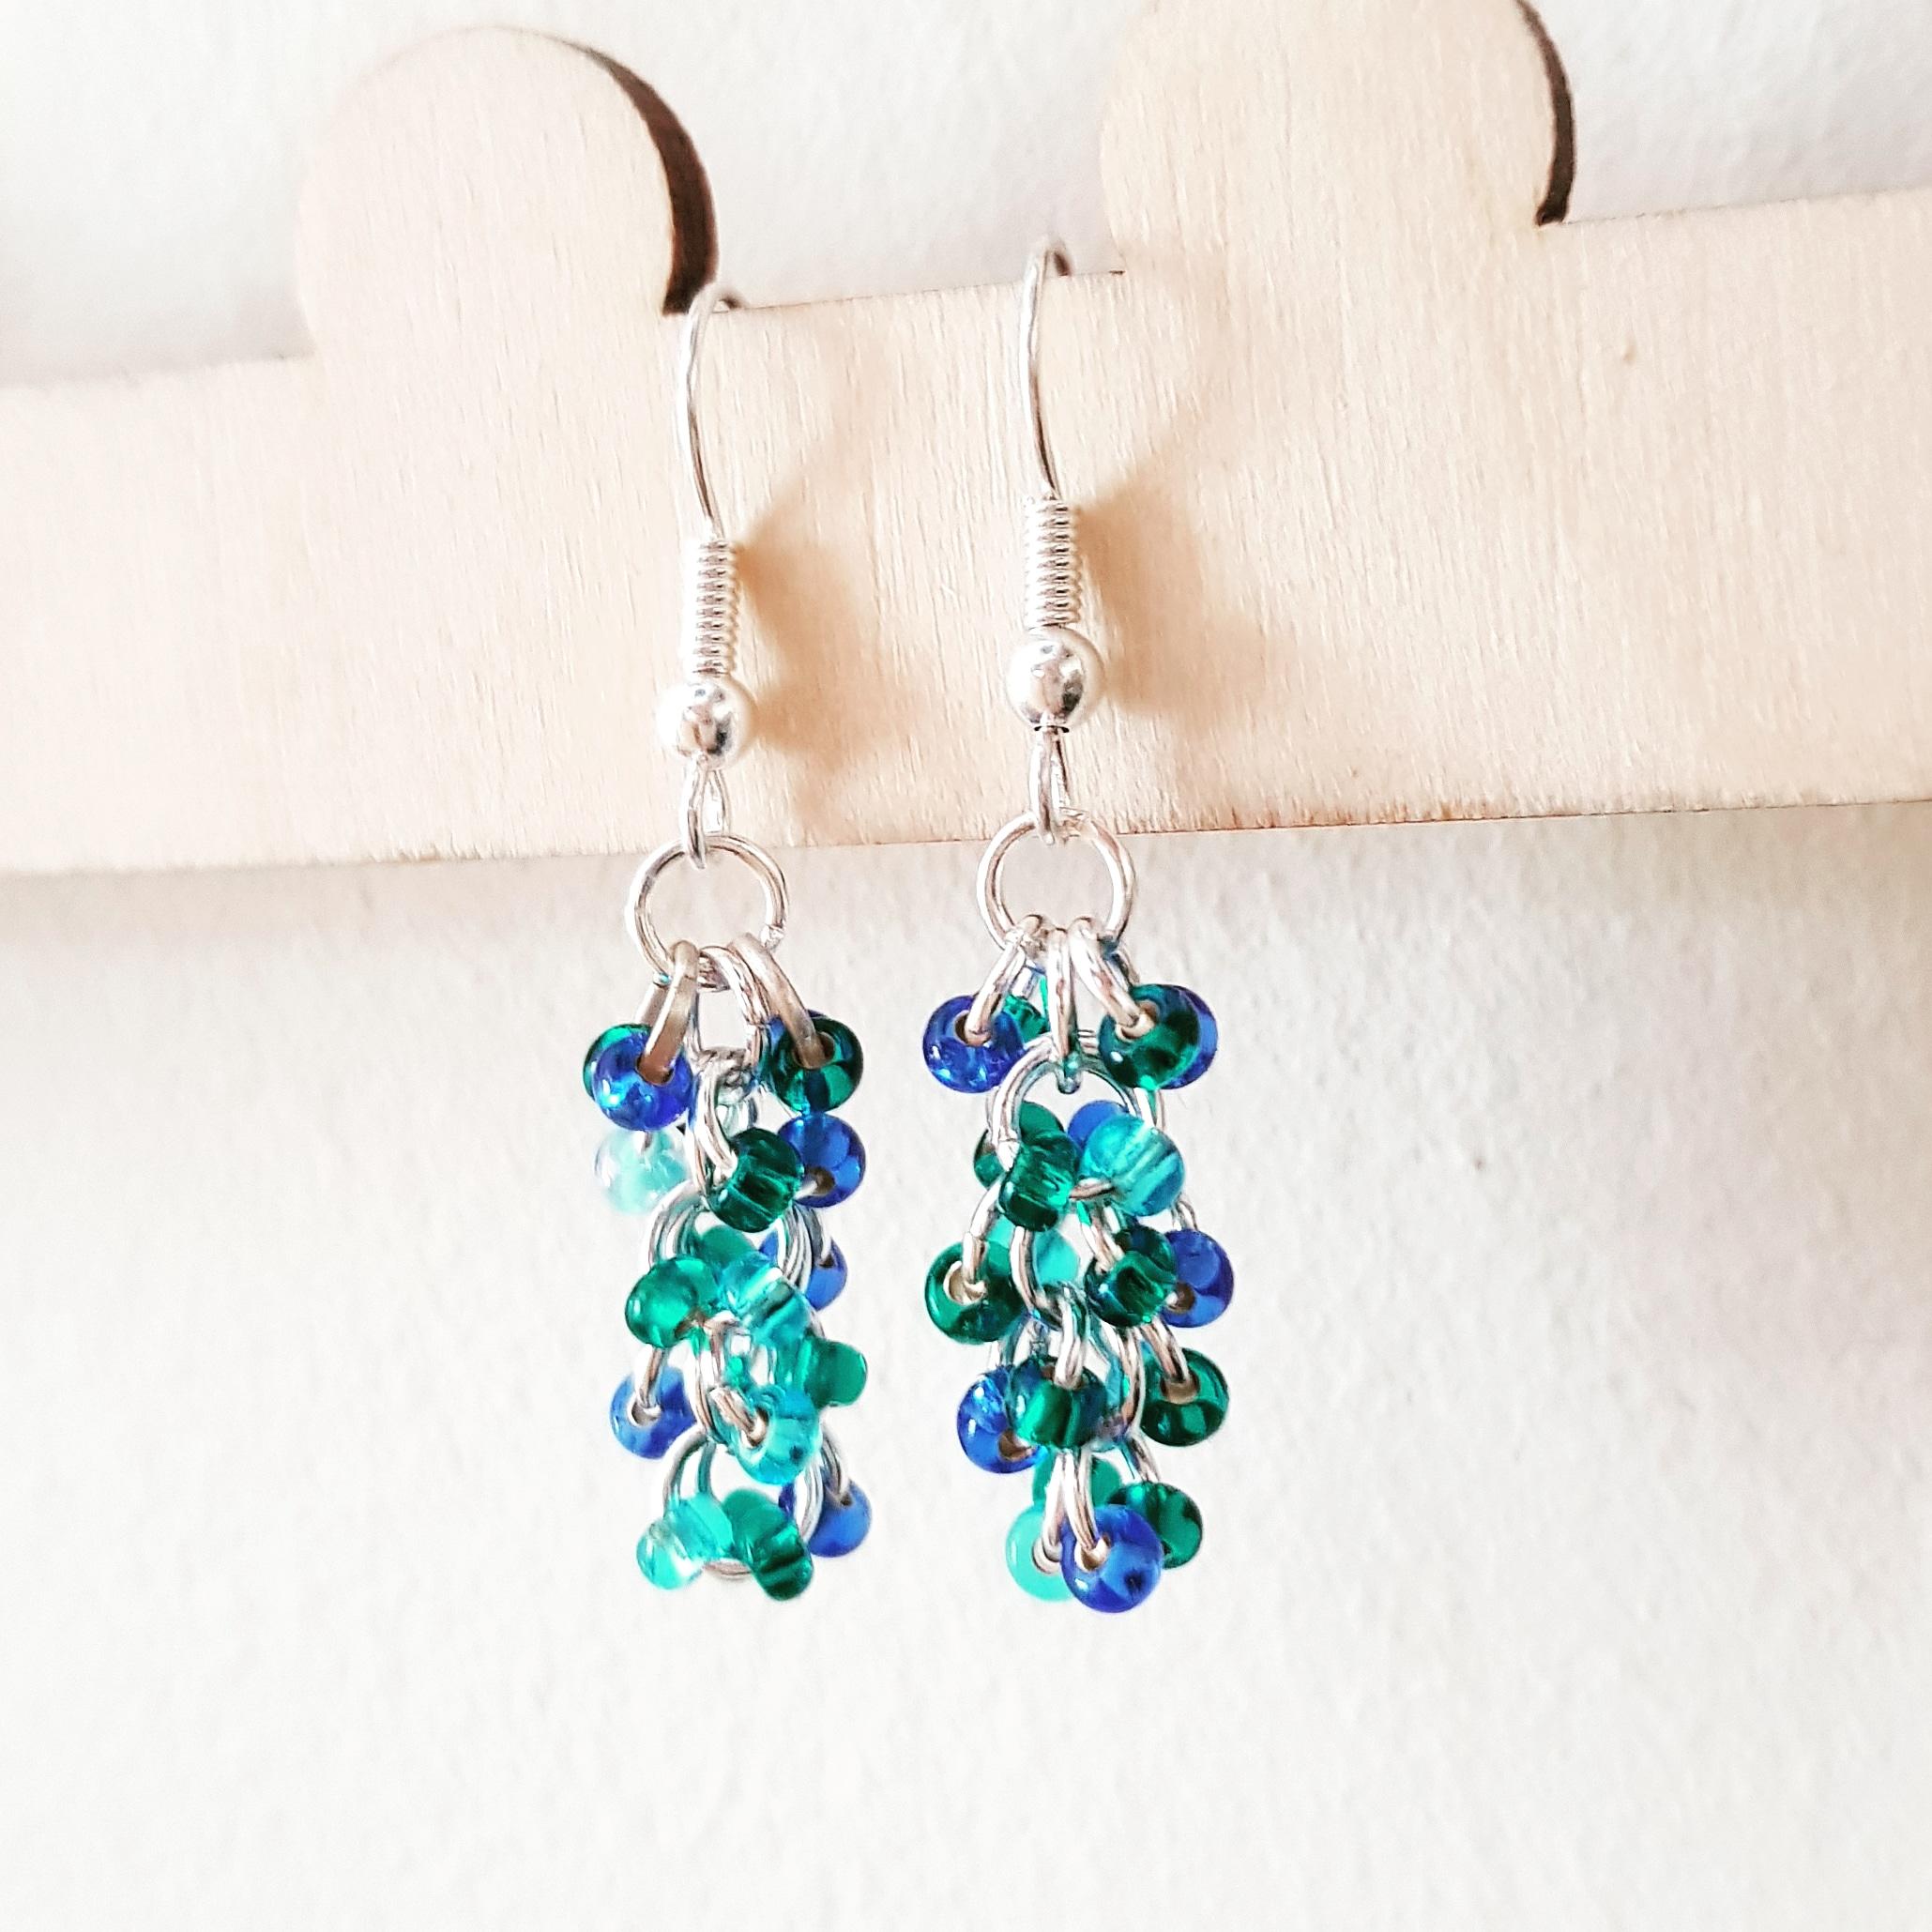 jump-ring-and-seed-bead-earrings.jpg